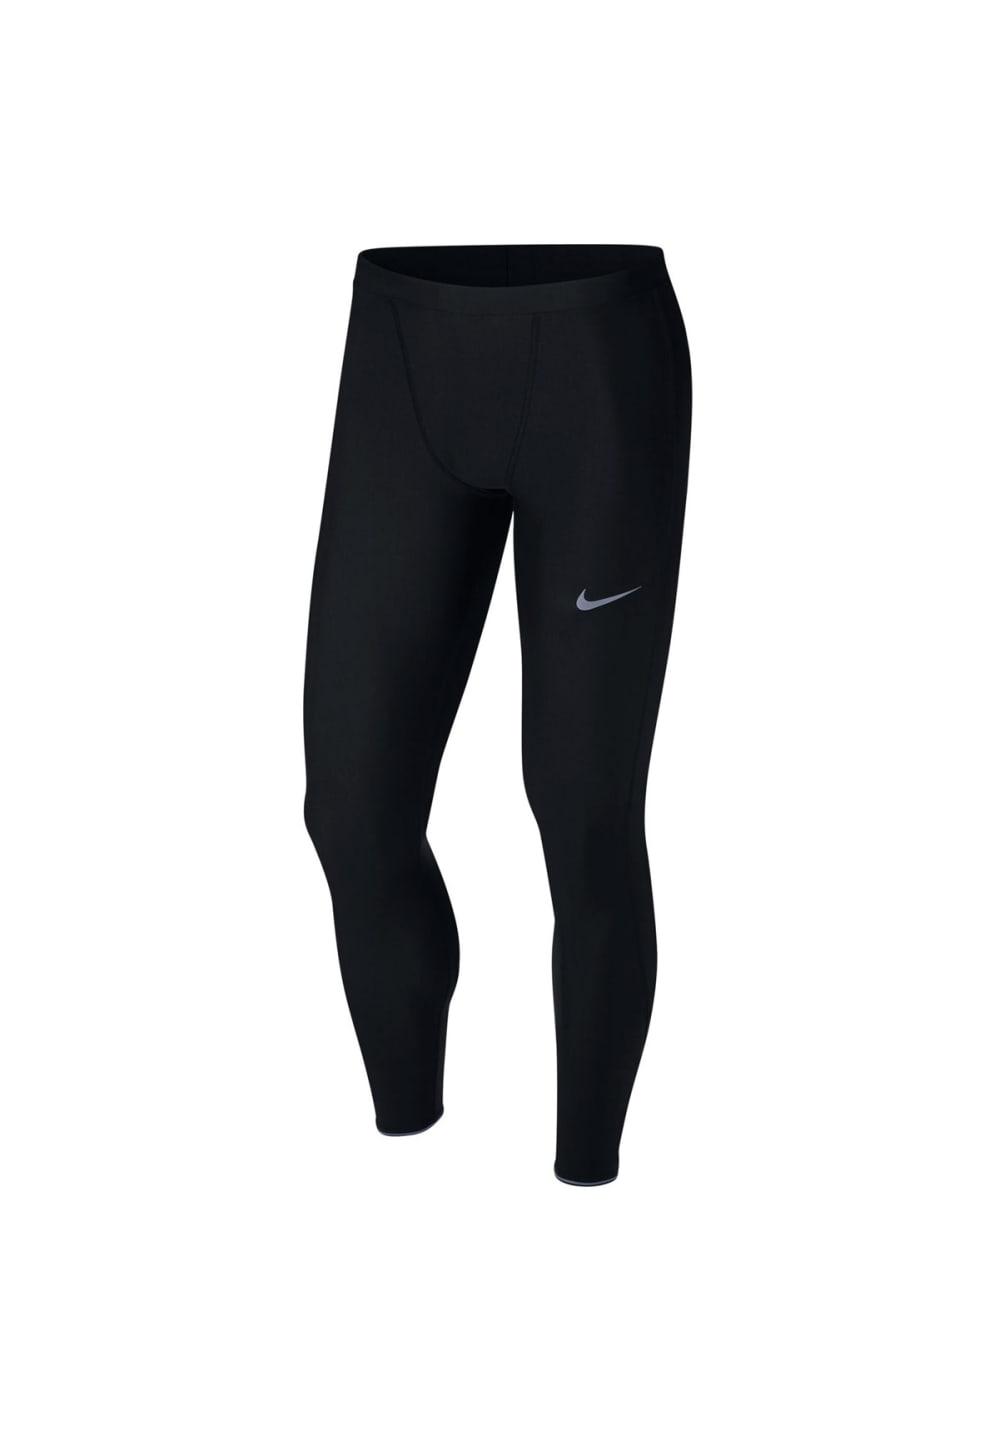 4e047a07f4538 Nike Run Mobility Right - Running trousers for Men - Black | 21RUN